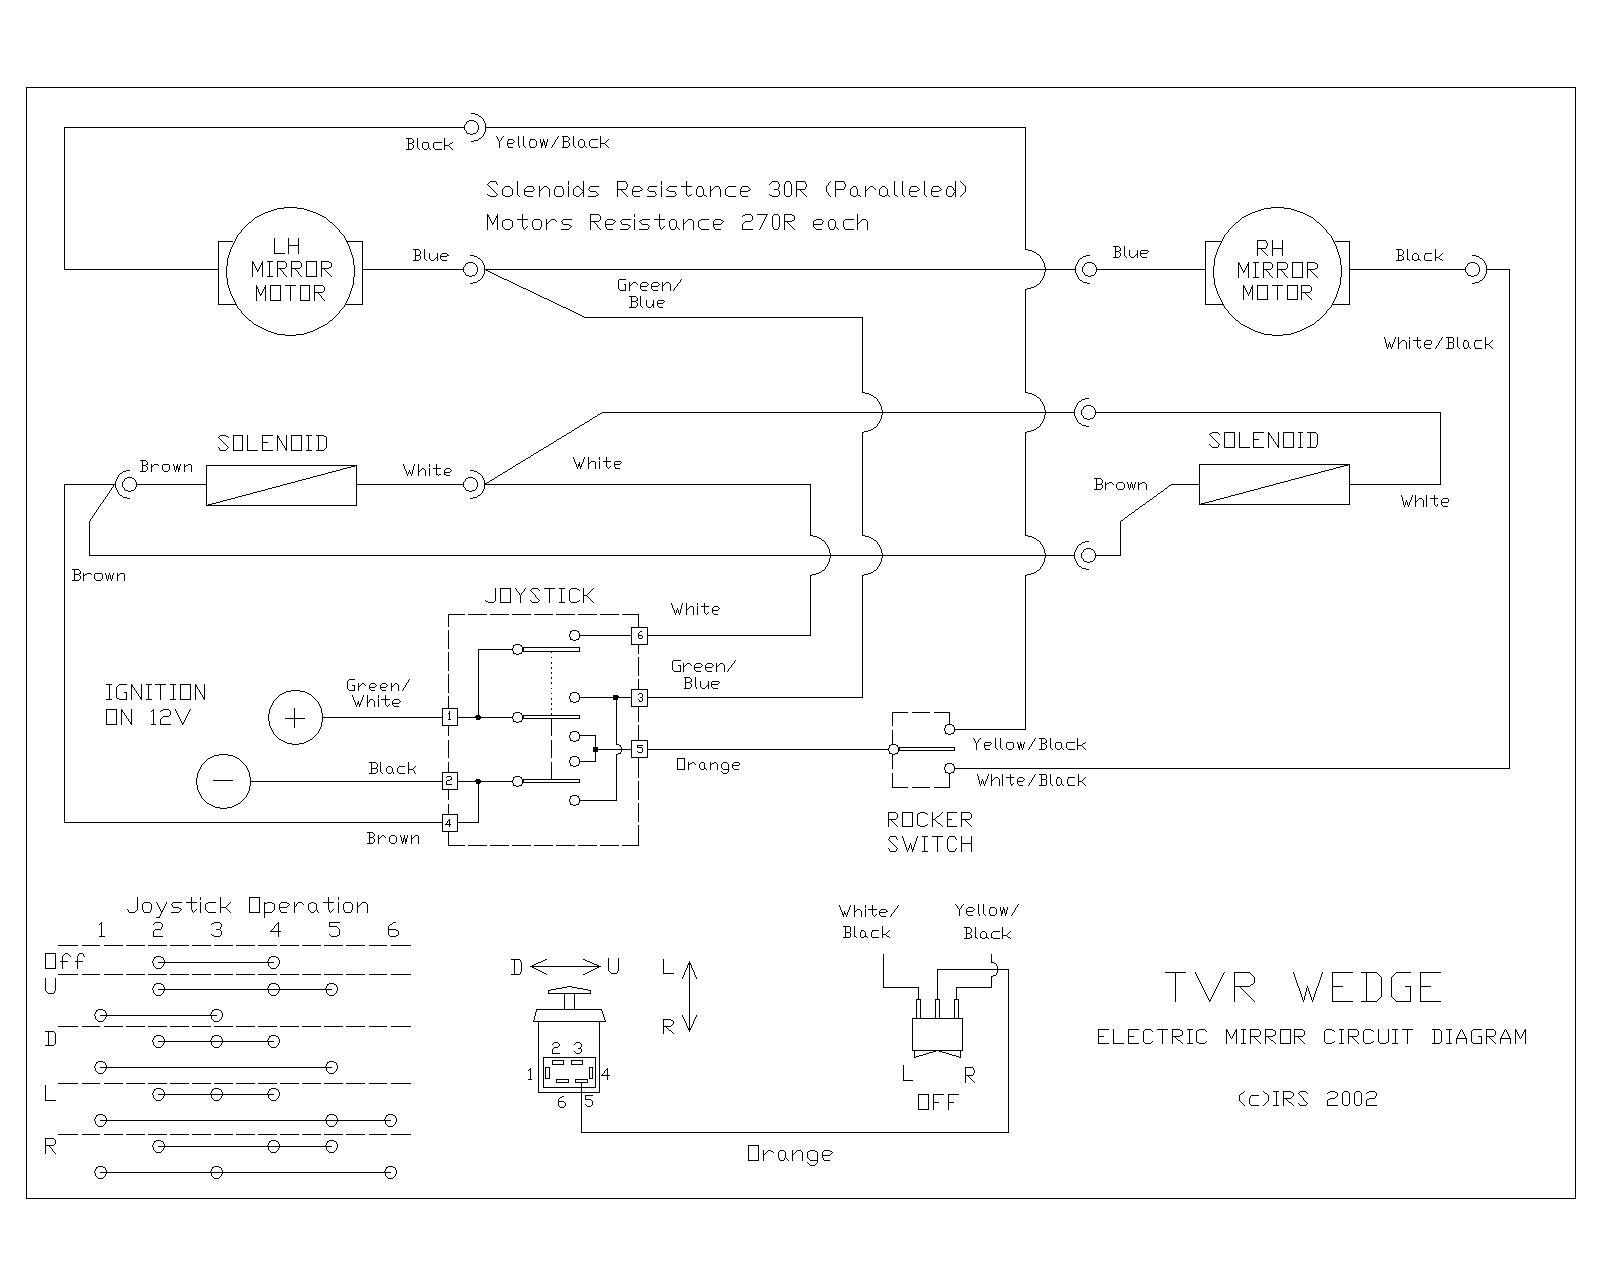 dragonfire pickups wiring diagram trailer light nz joystick nissan altima pdf kwik wire 8 circuit harness